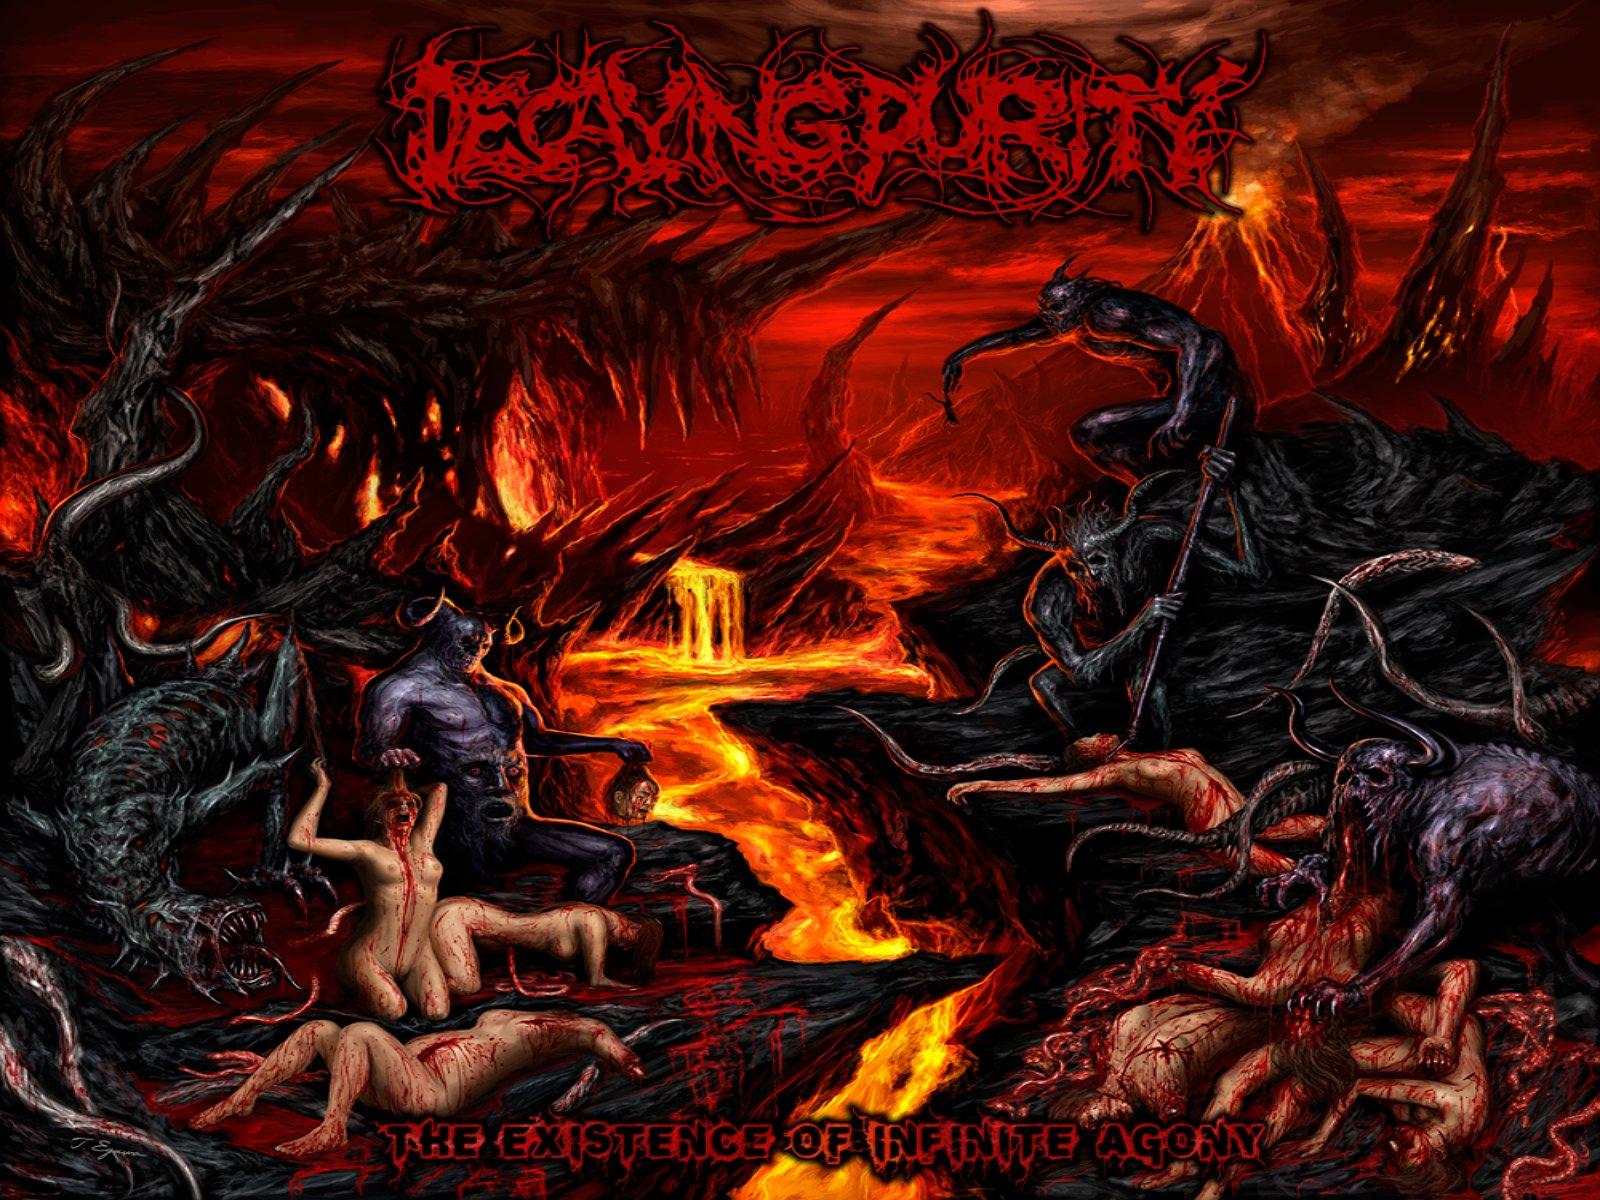 wallpaper 1600x1200 px blood dark death evil heavy hell